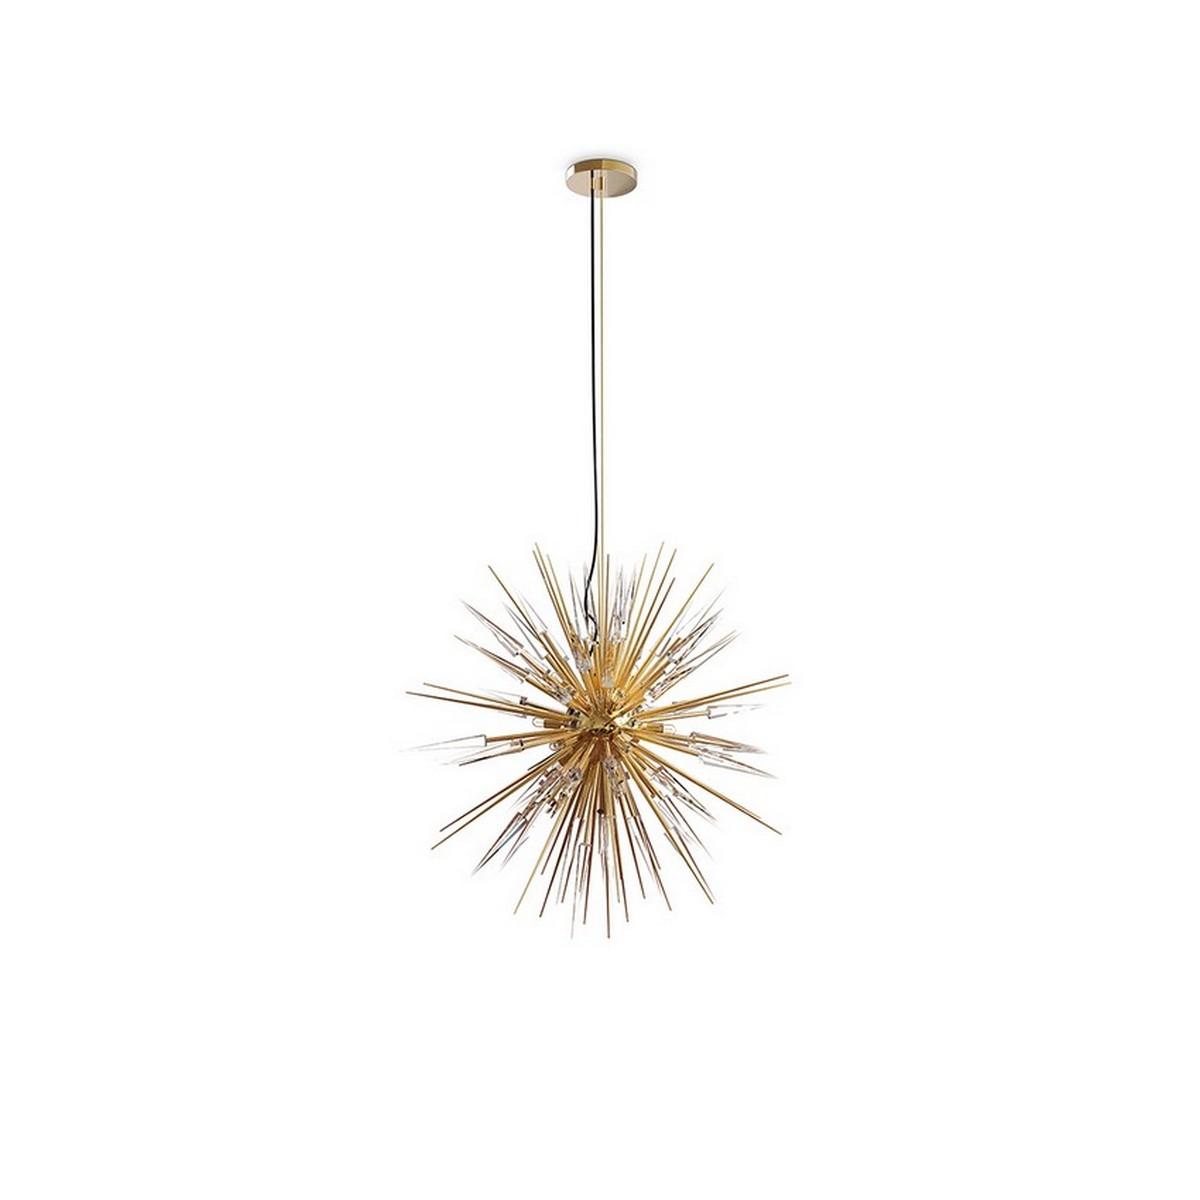 Ideas para Interiores: Belleza para un proyecto lujuoso con Texturas ideas para interiores Ideas para Interiores: Belleza para un proyecto lujuoso con Texturas luxxu explosion suspension